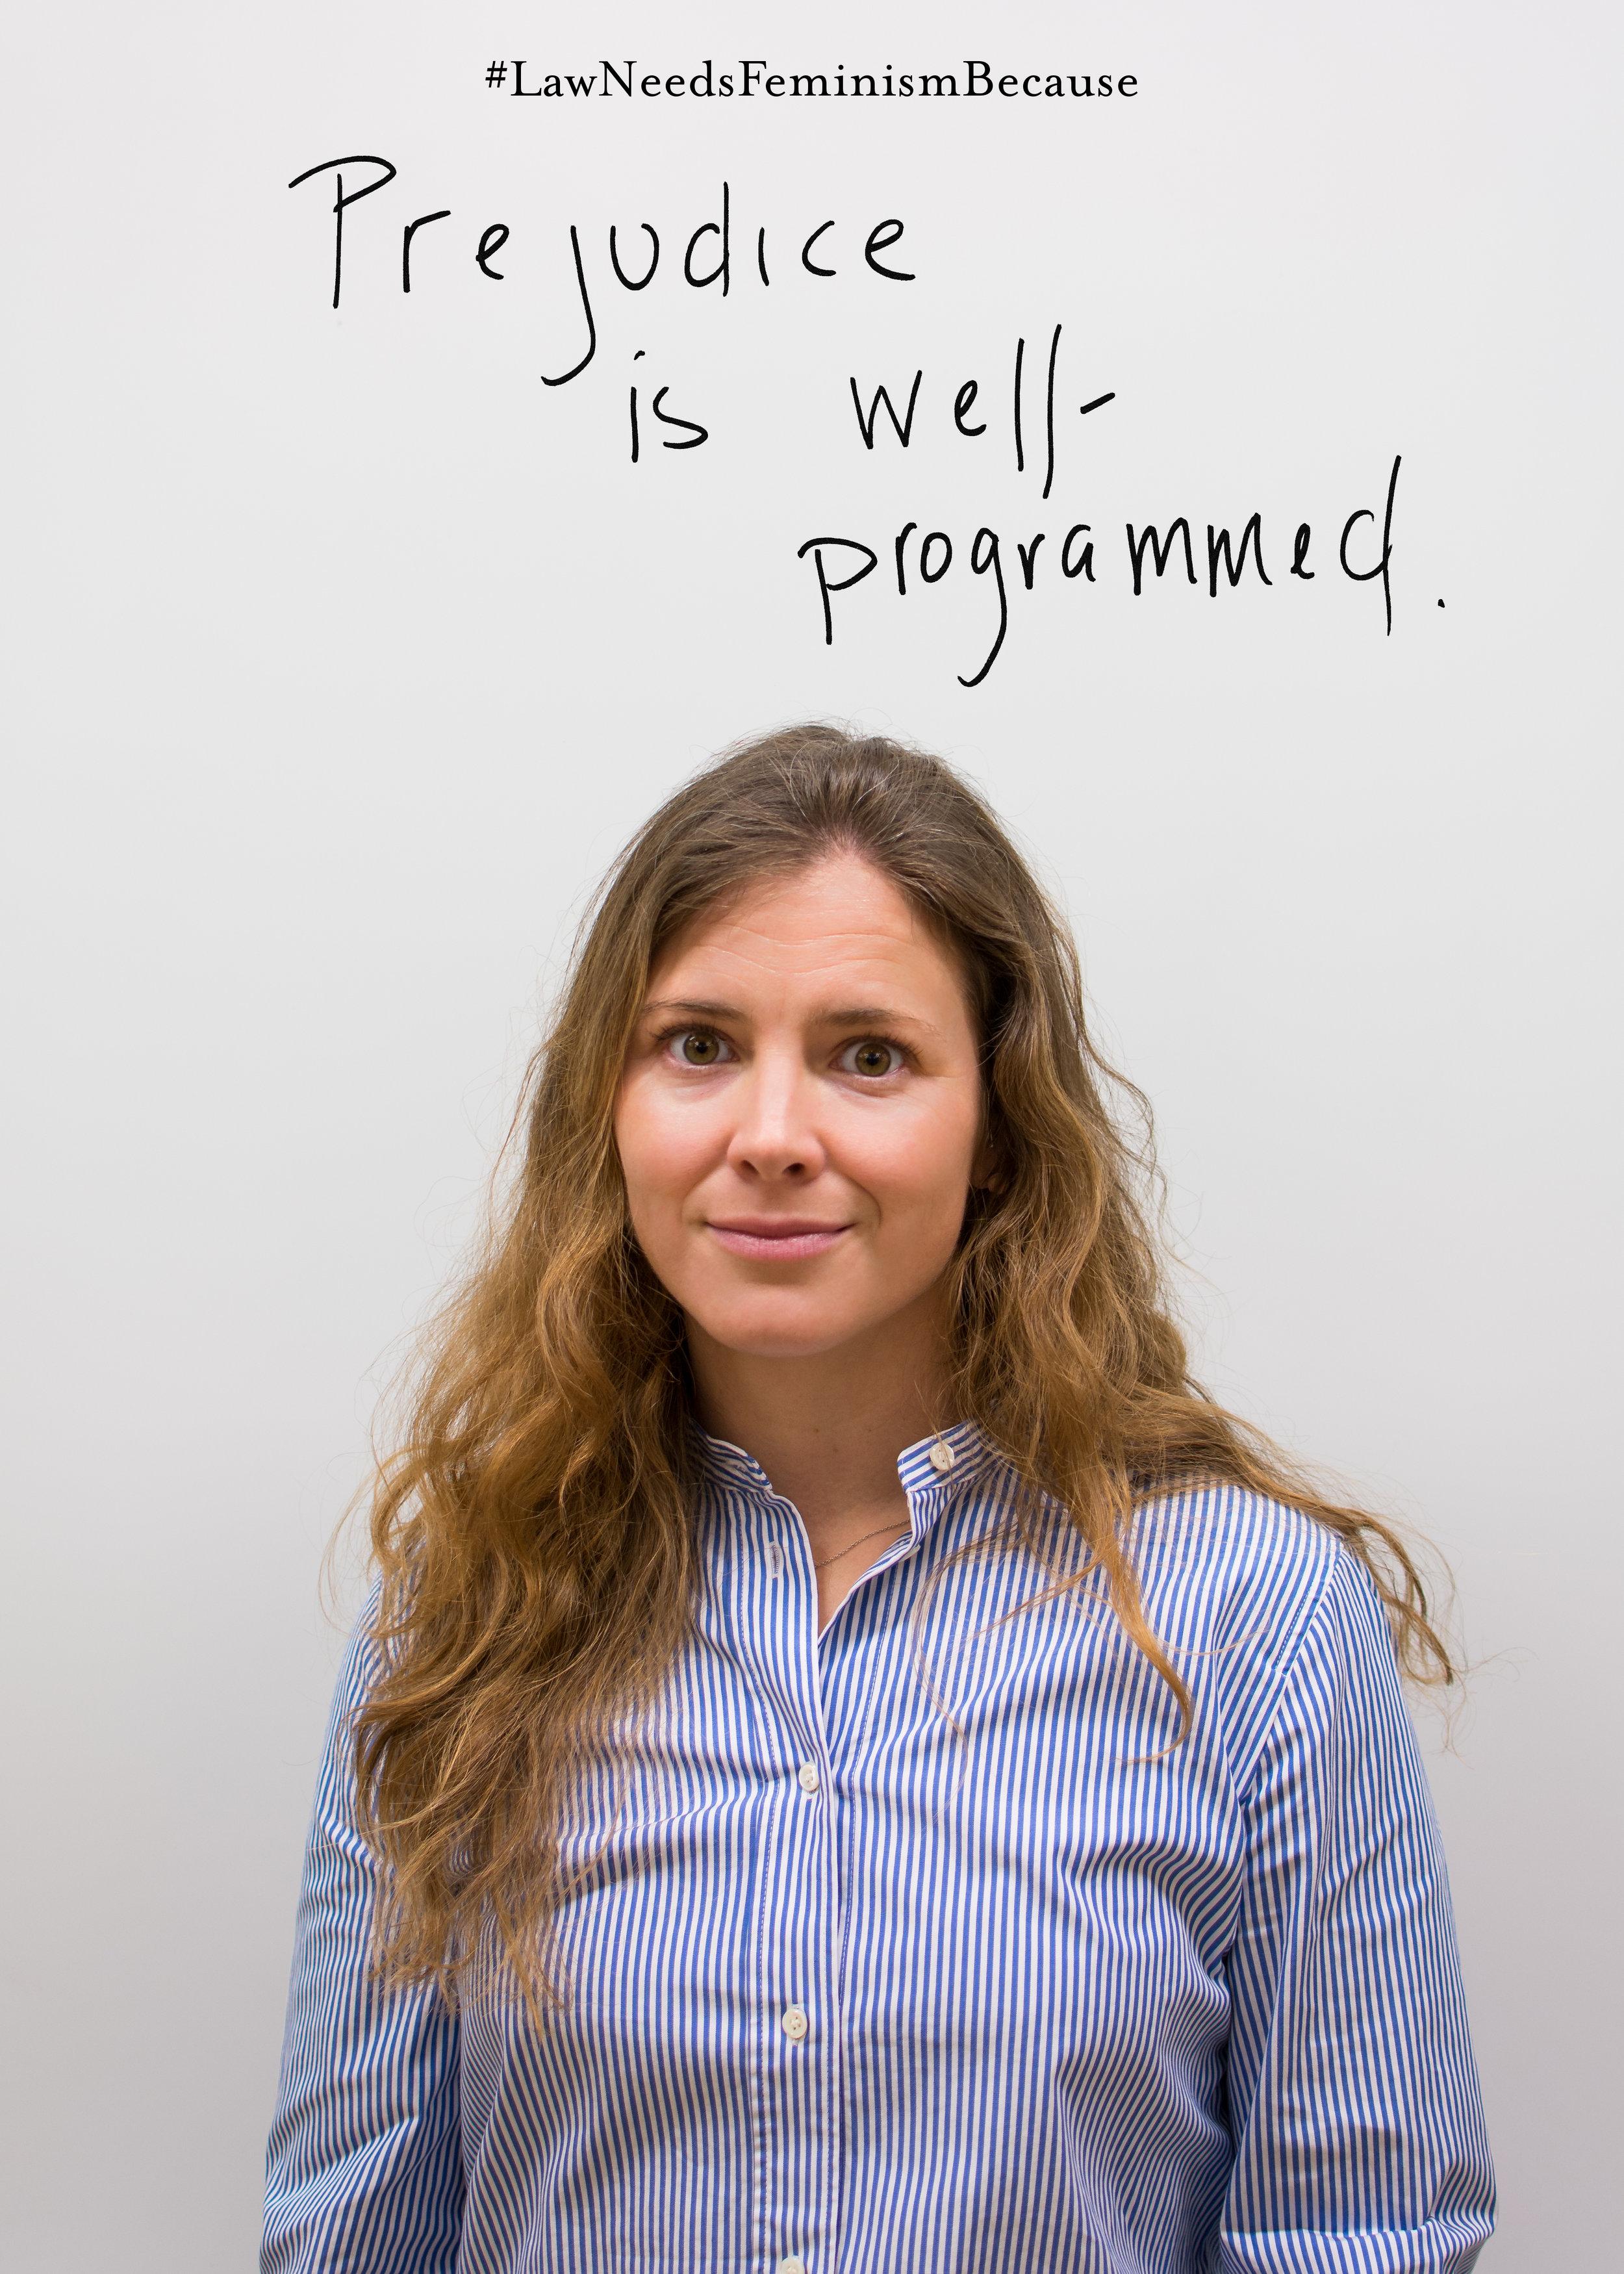 SarahMurphy+blurb.jpg